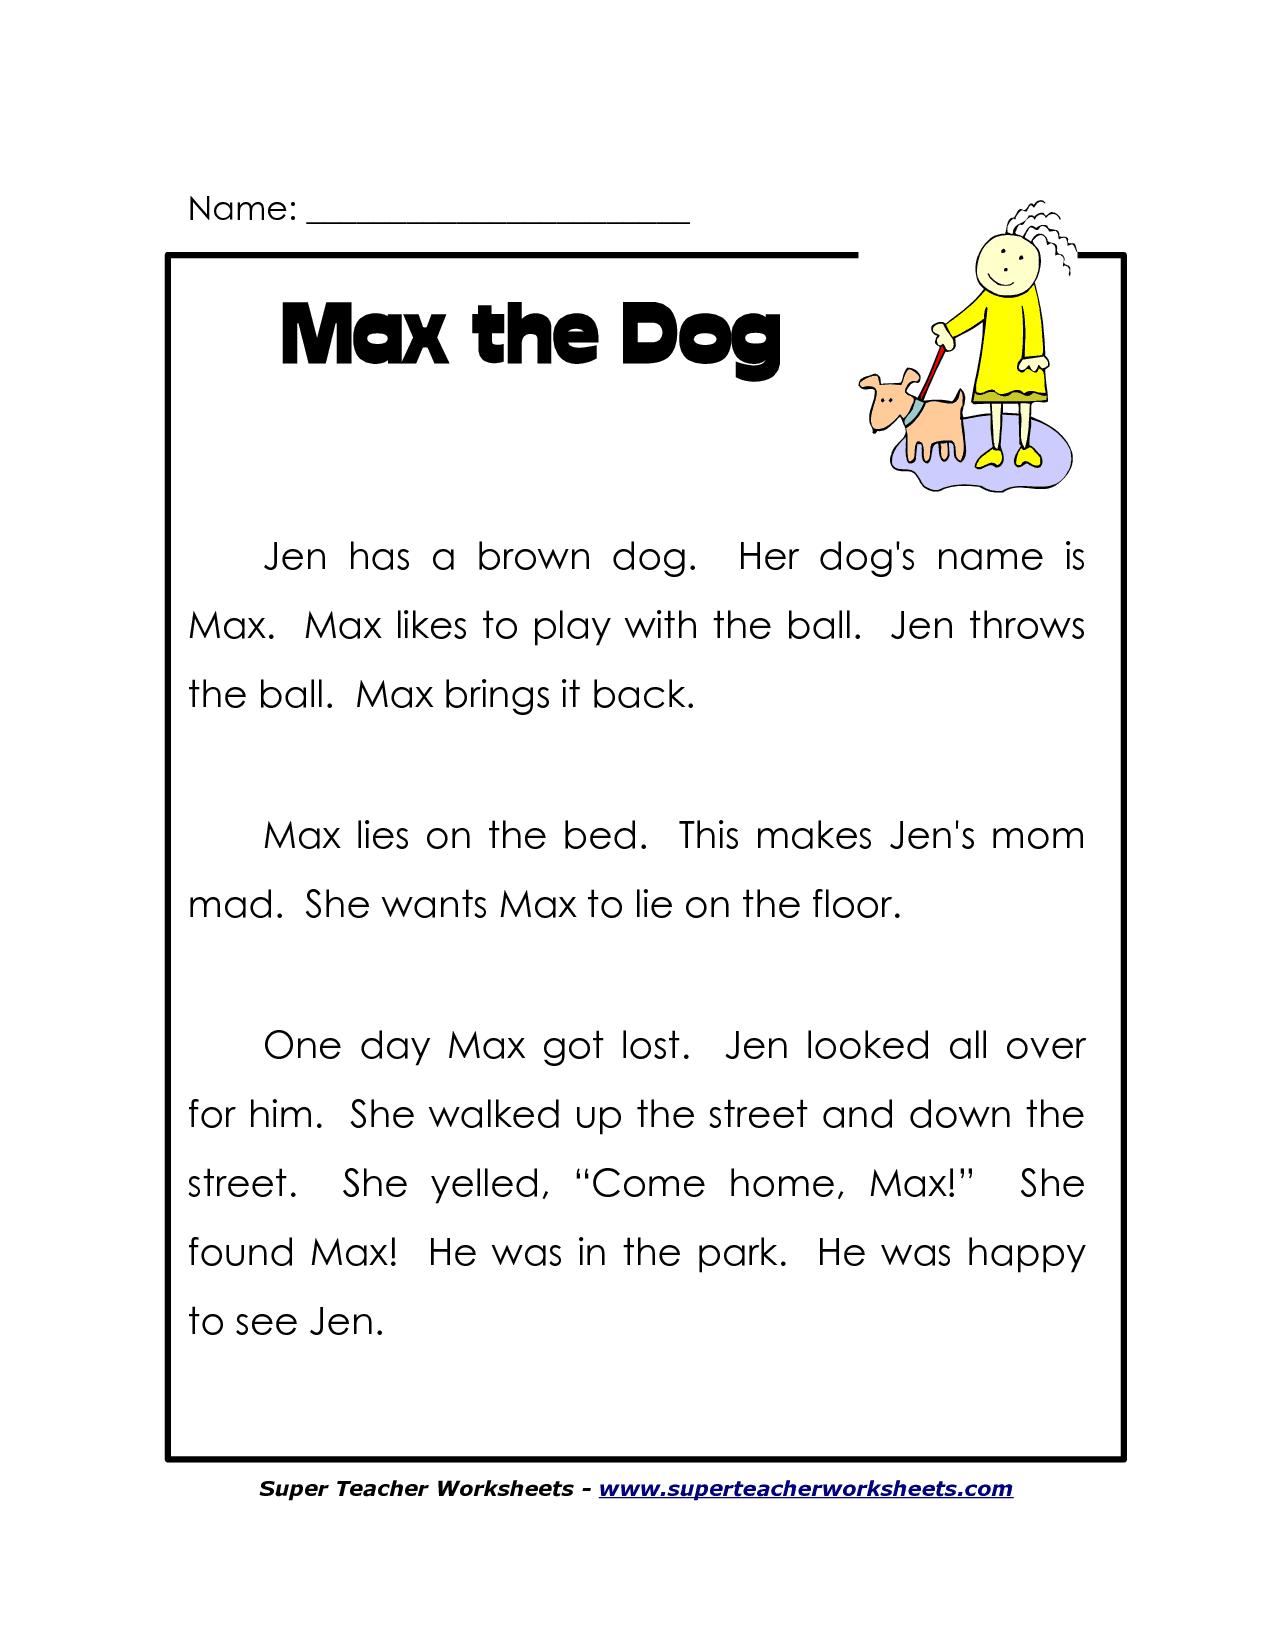 Free Printable Comprehension Worksheets For Grade 1 And 1st Grade Reading  Comp…   1st grade reading worksheets [ 1650 x 1275 Pixel ]